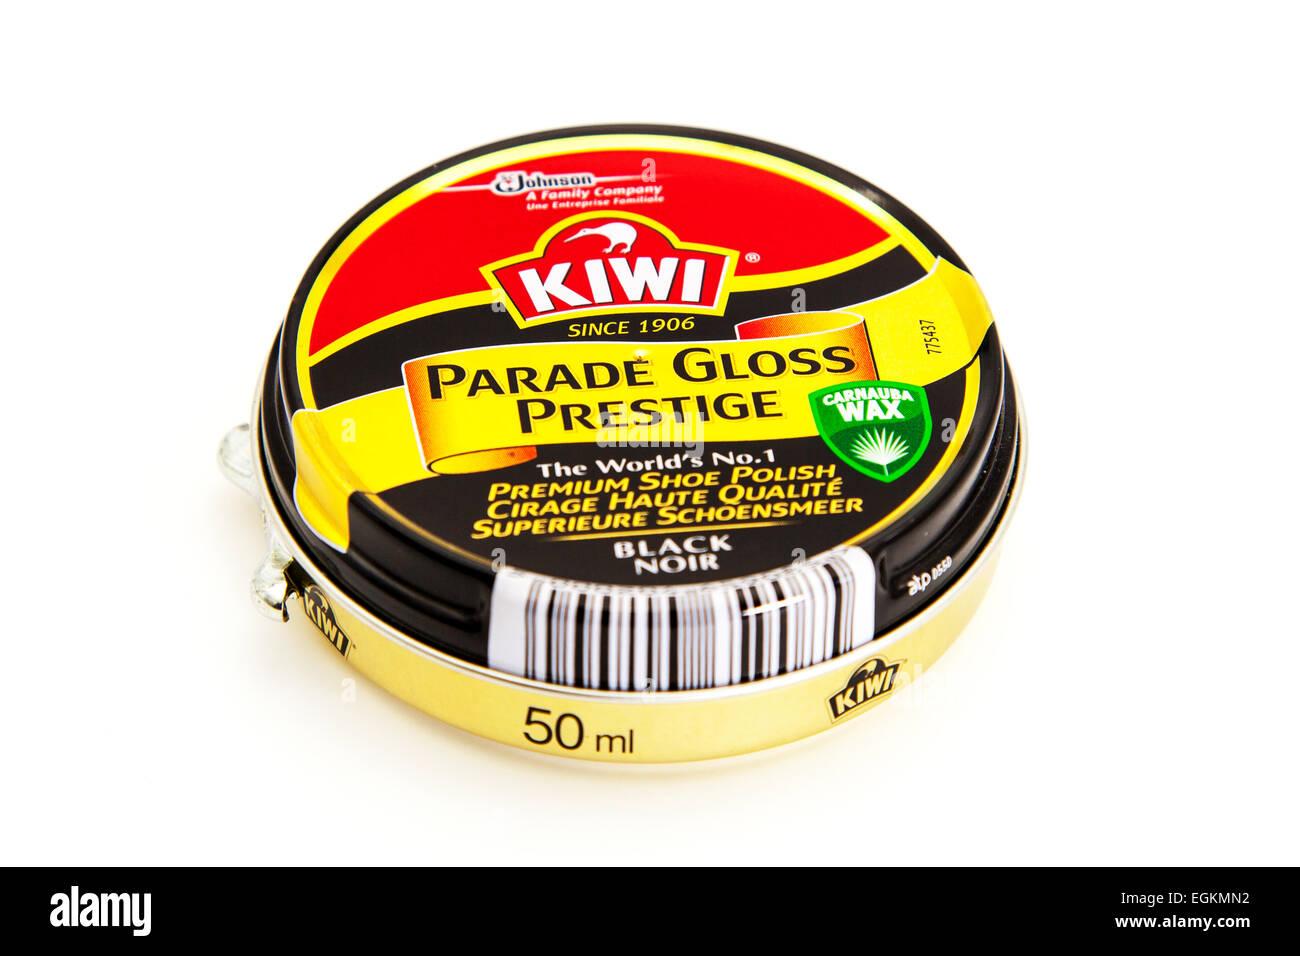 Kiwi shoe polish parade gloss prestige black tin product logo 50ml container cutout cut out white background copy - Stock Image